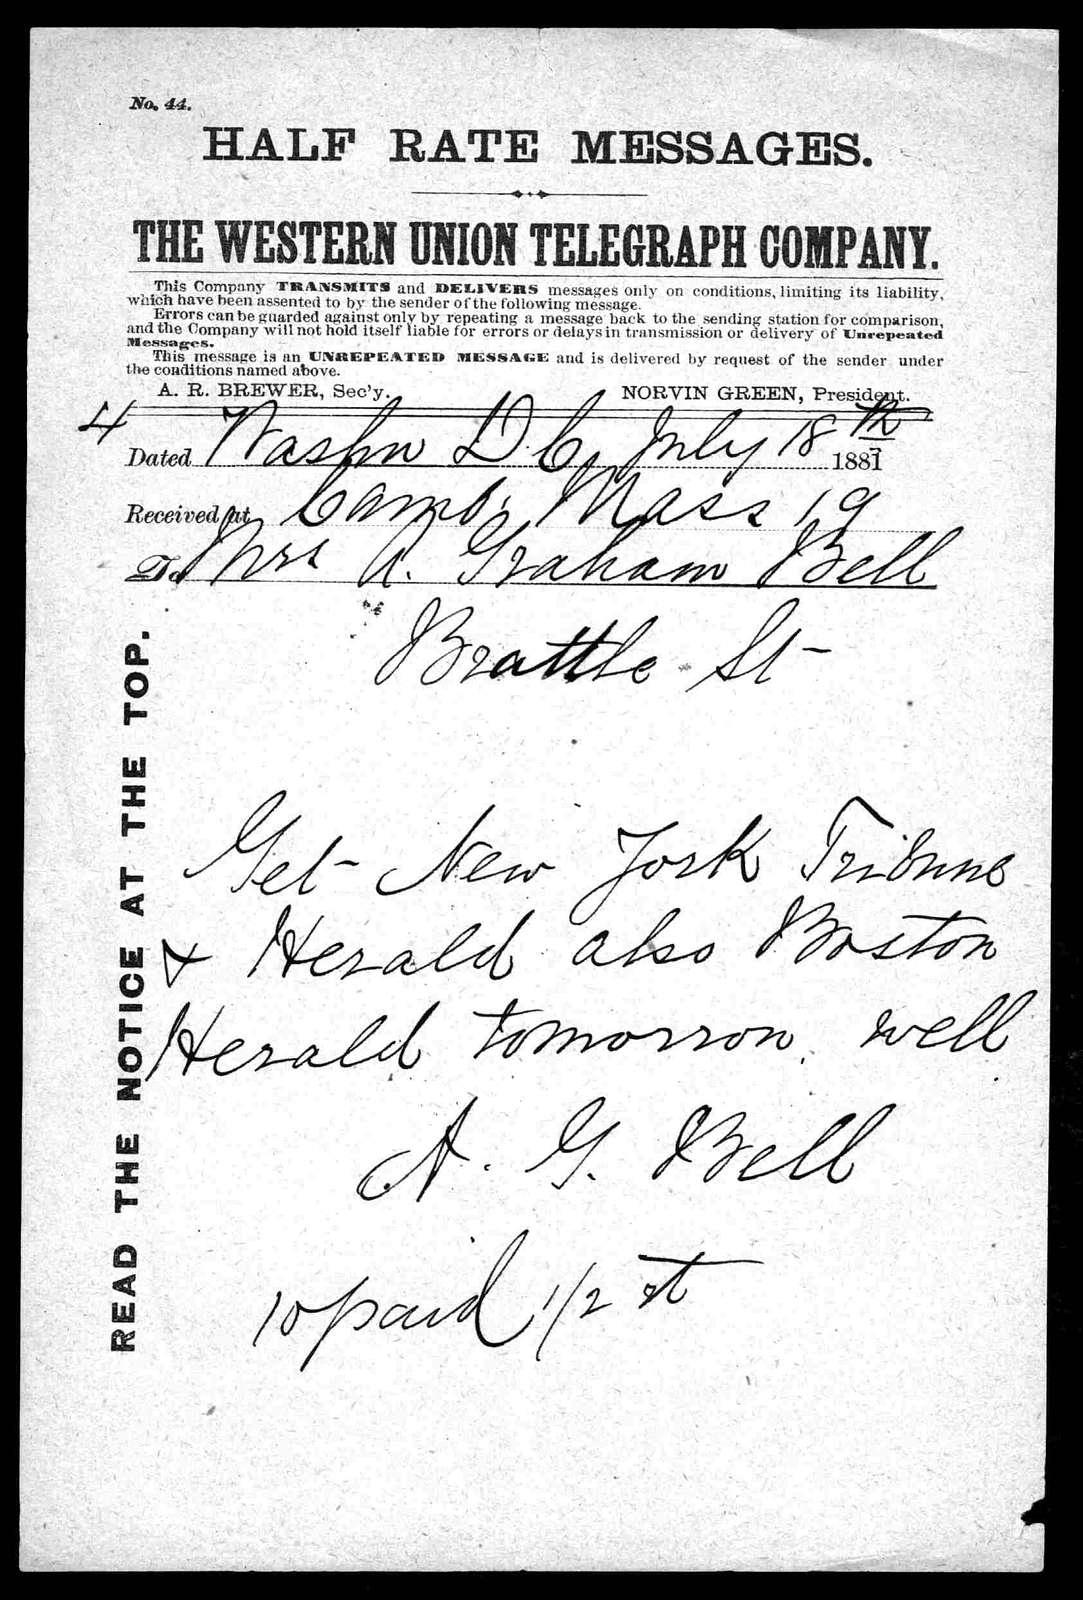 Telegram from Alexander Graham Bell to Mabel Hubbard Bell, July 18, 1881